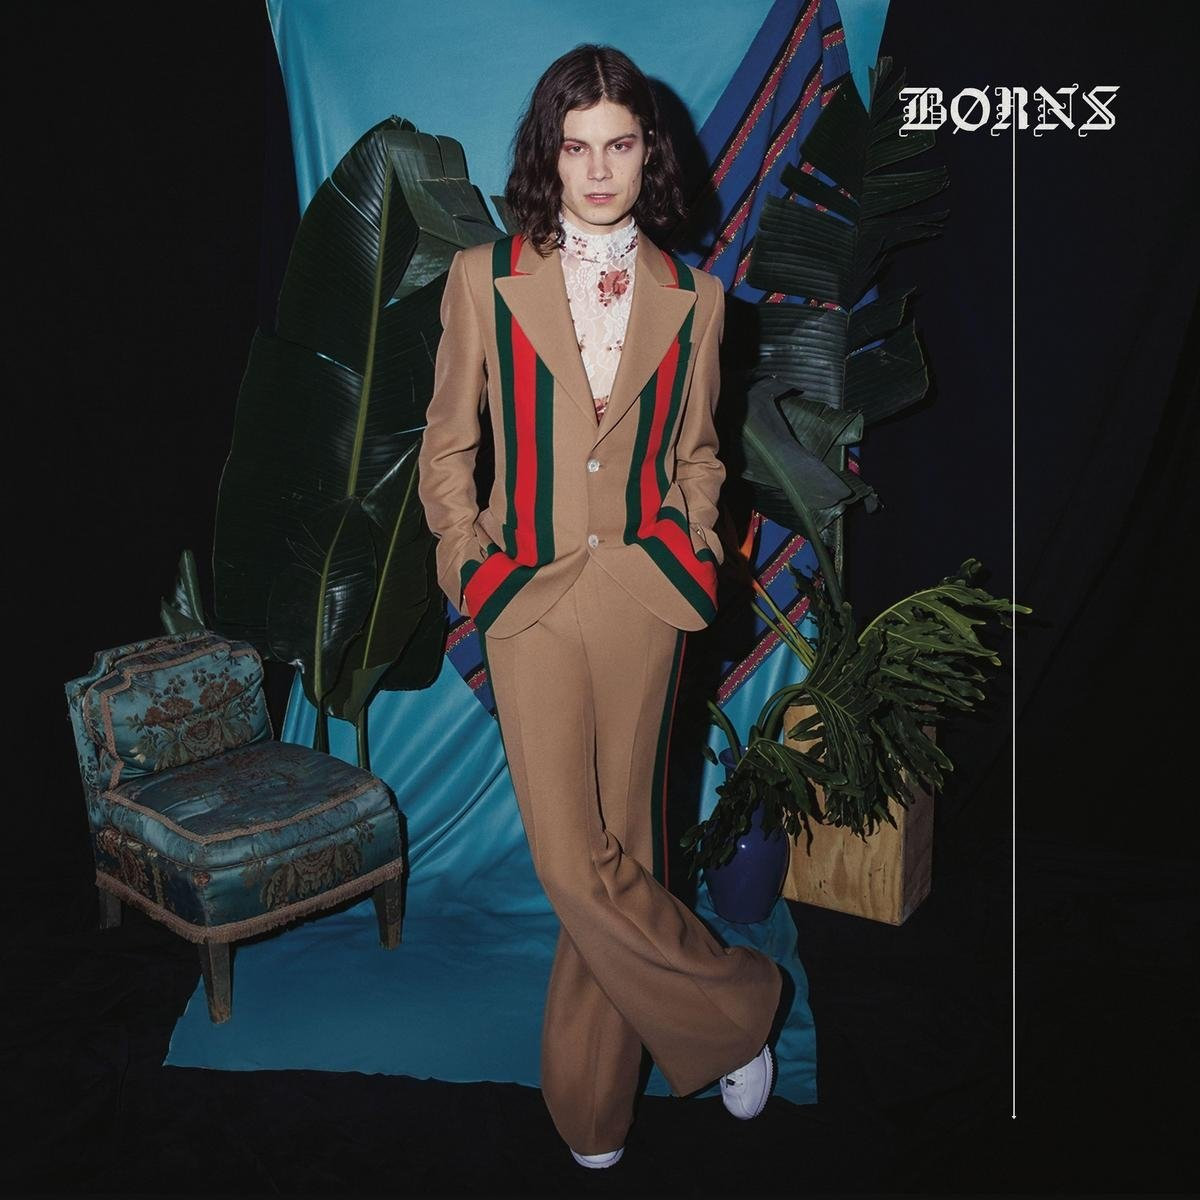 CD : Borns - Blue Madonna